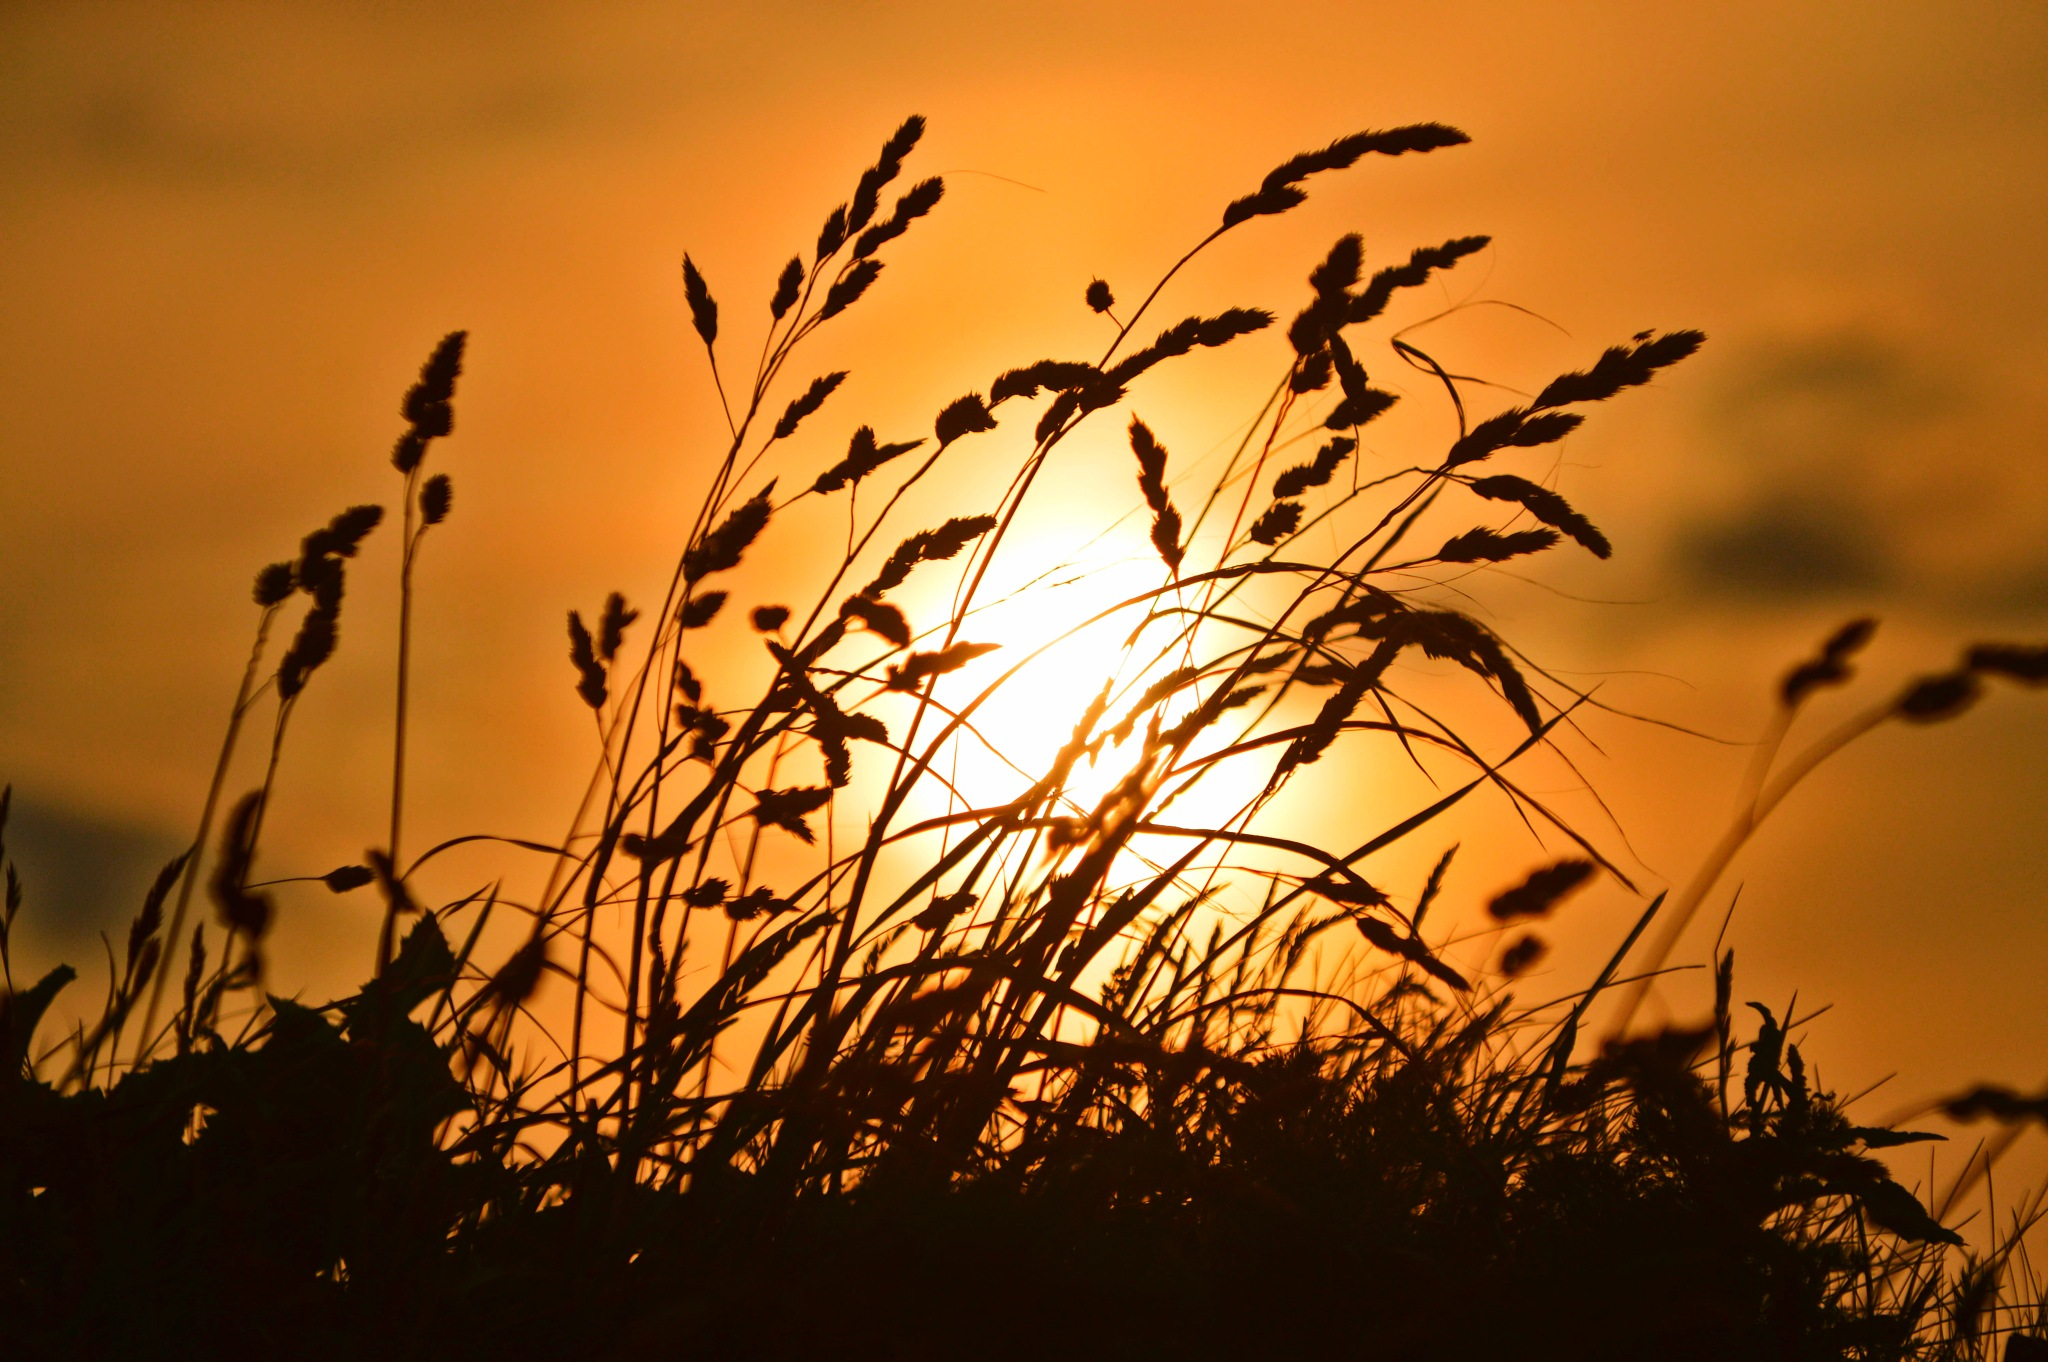 Sunset through the grass by Deryk Durrant